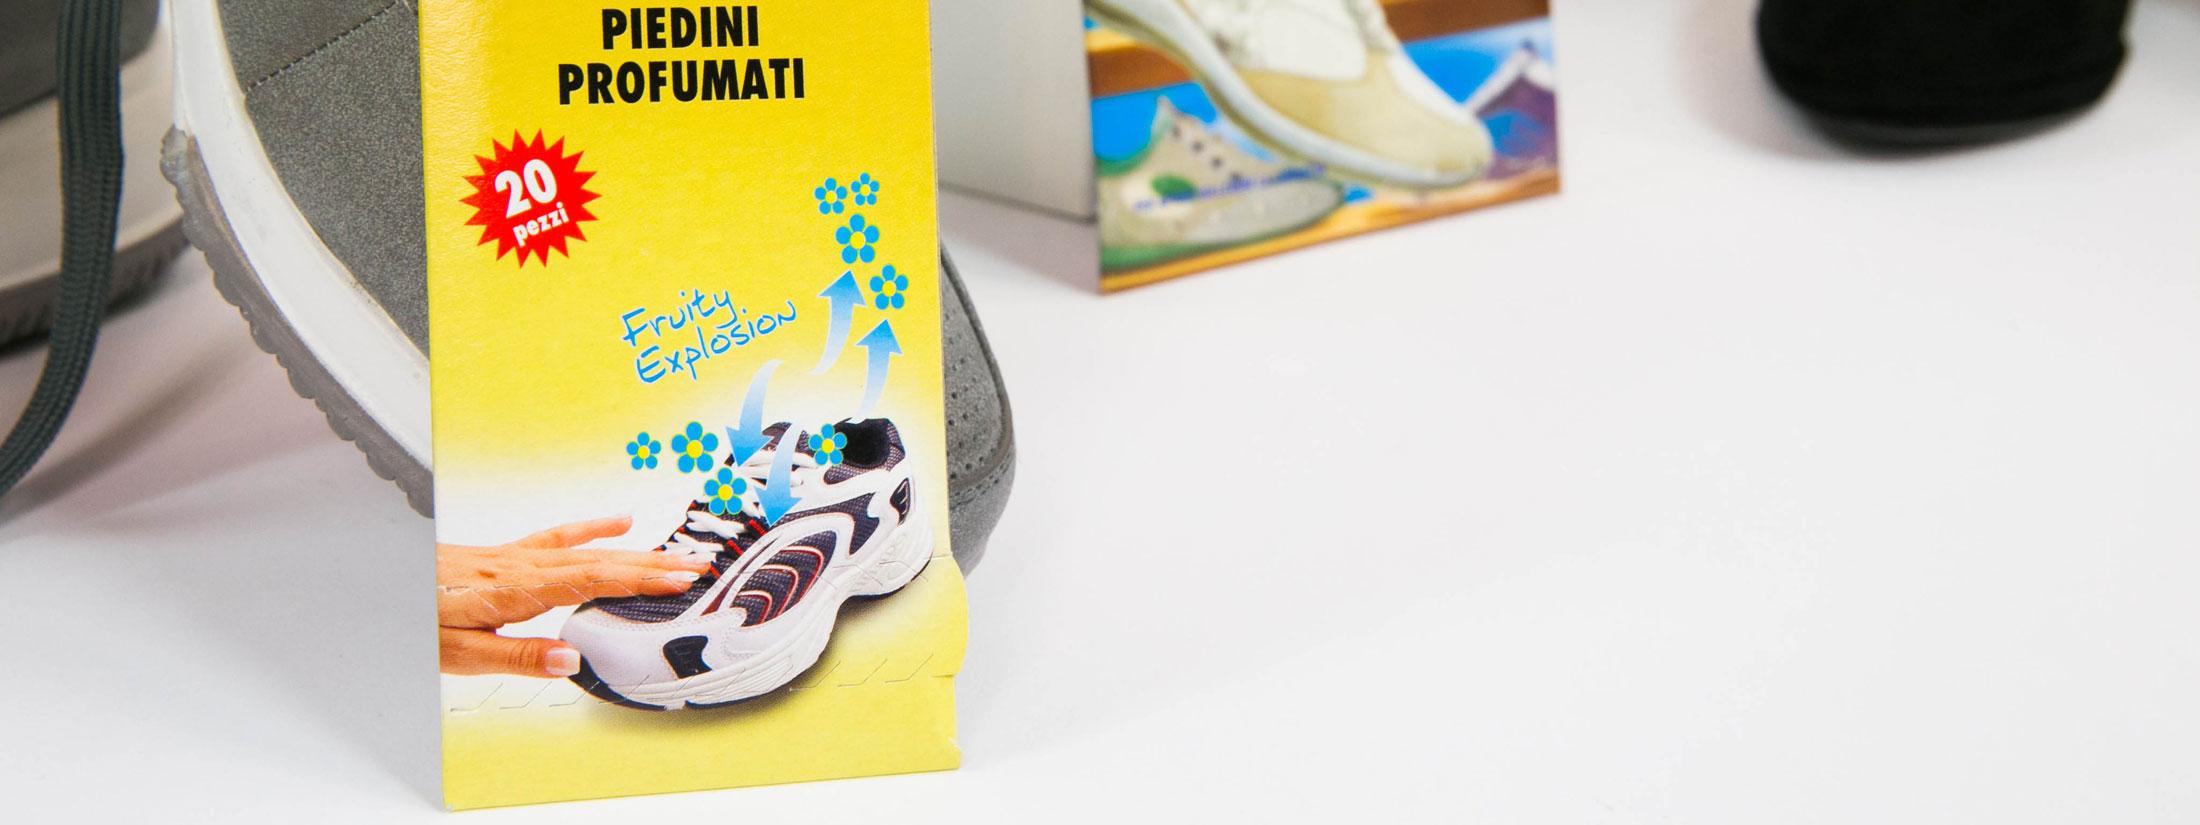 profumatori-scarpe-1